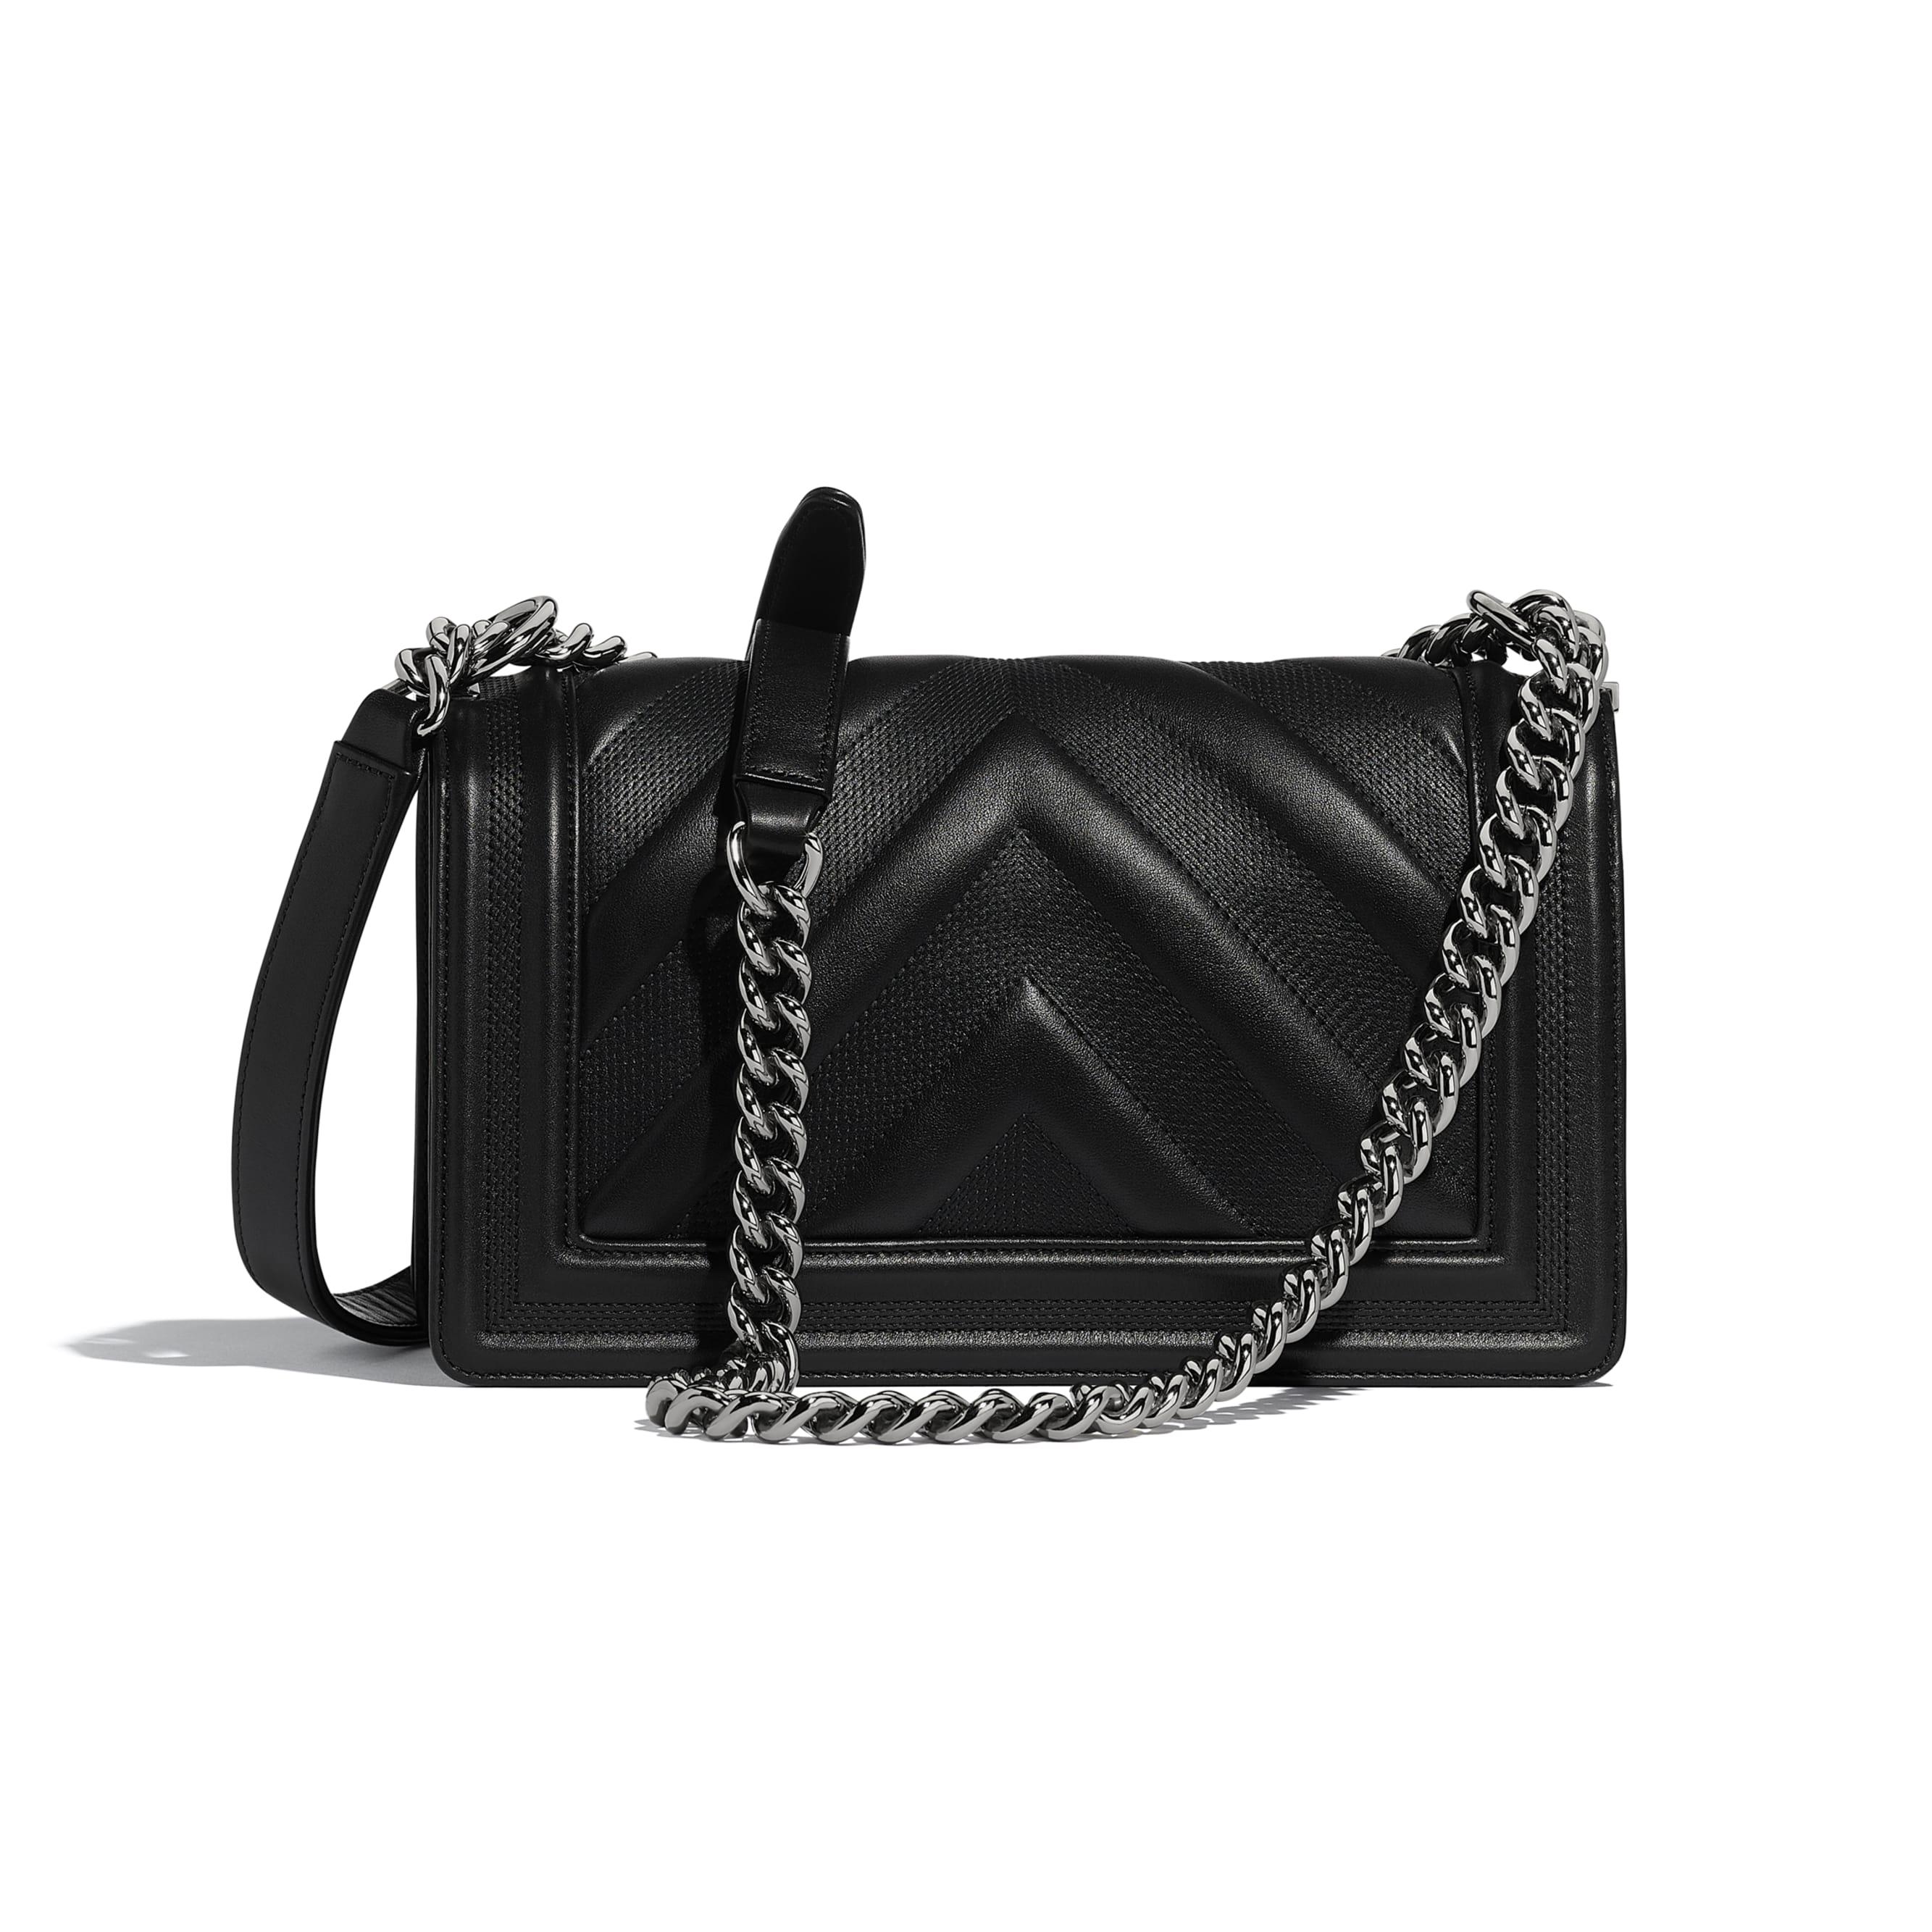 BOY CHANEL Handbag - Black - Calfskin & Ruthenium-Finish Metal - Alternative view - see standard sized version